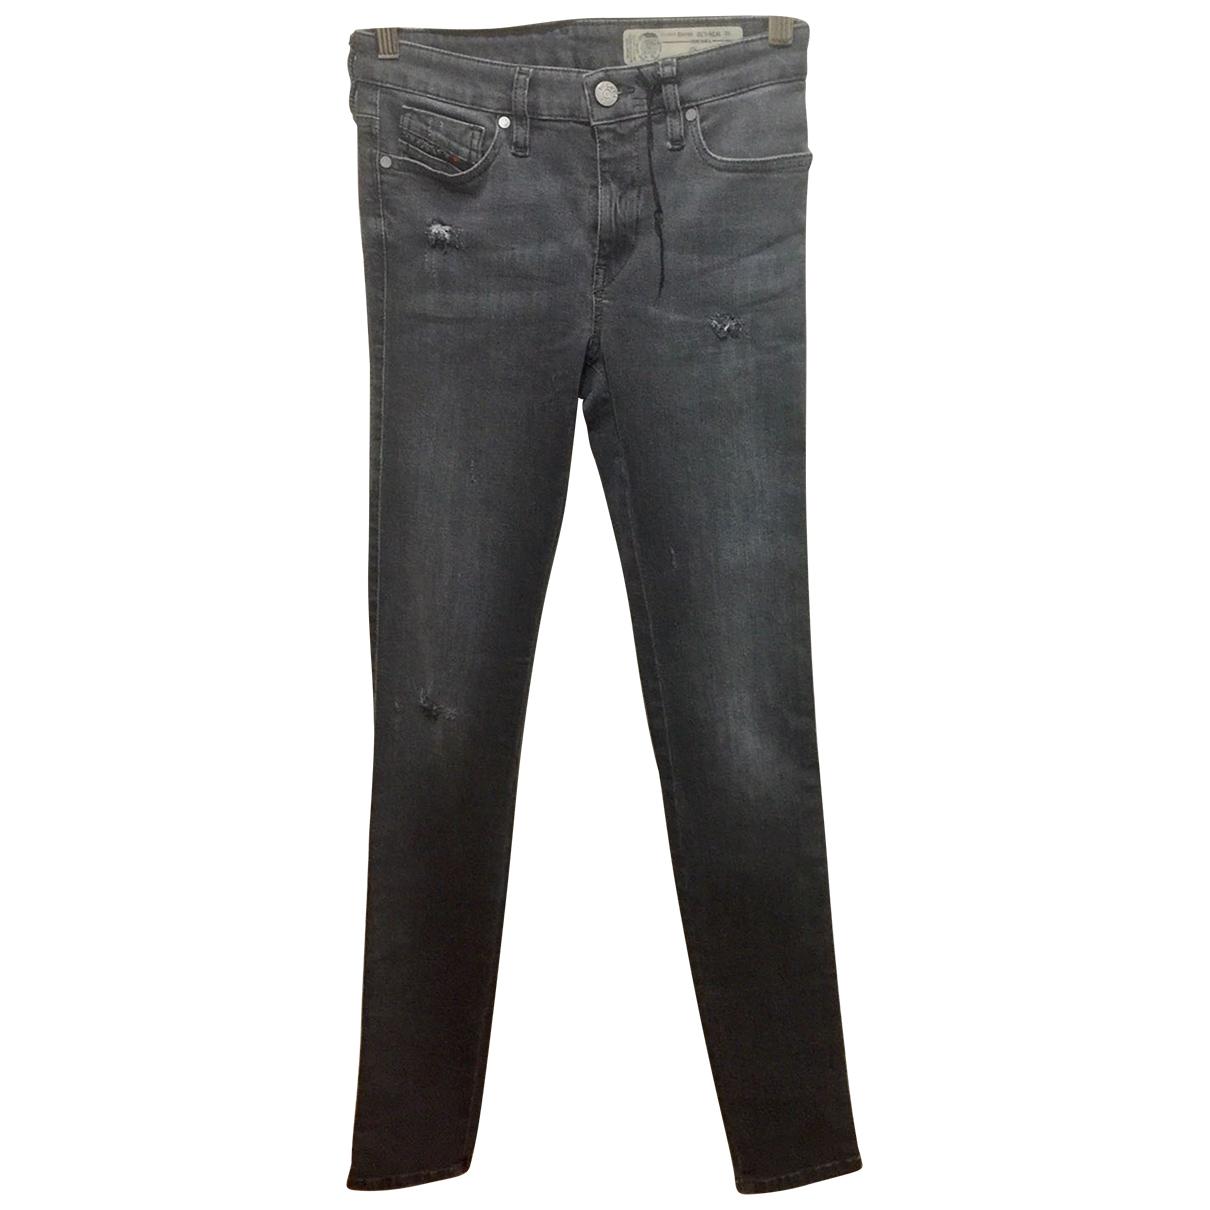 Diesel N Grey Cotton - elasthane Jeans for Women 26 US